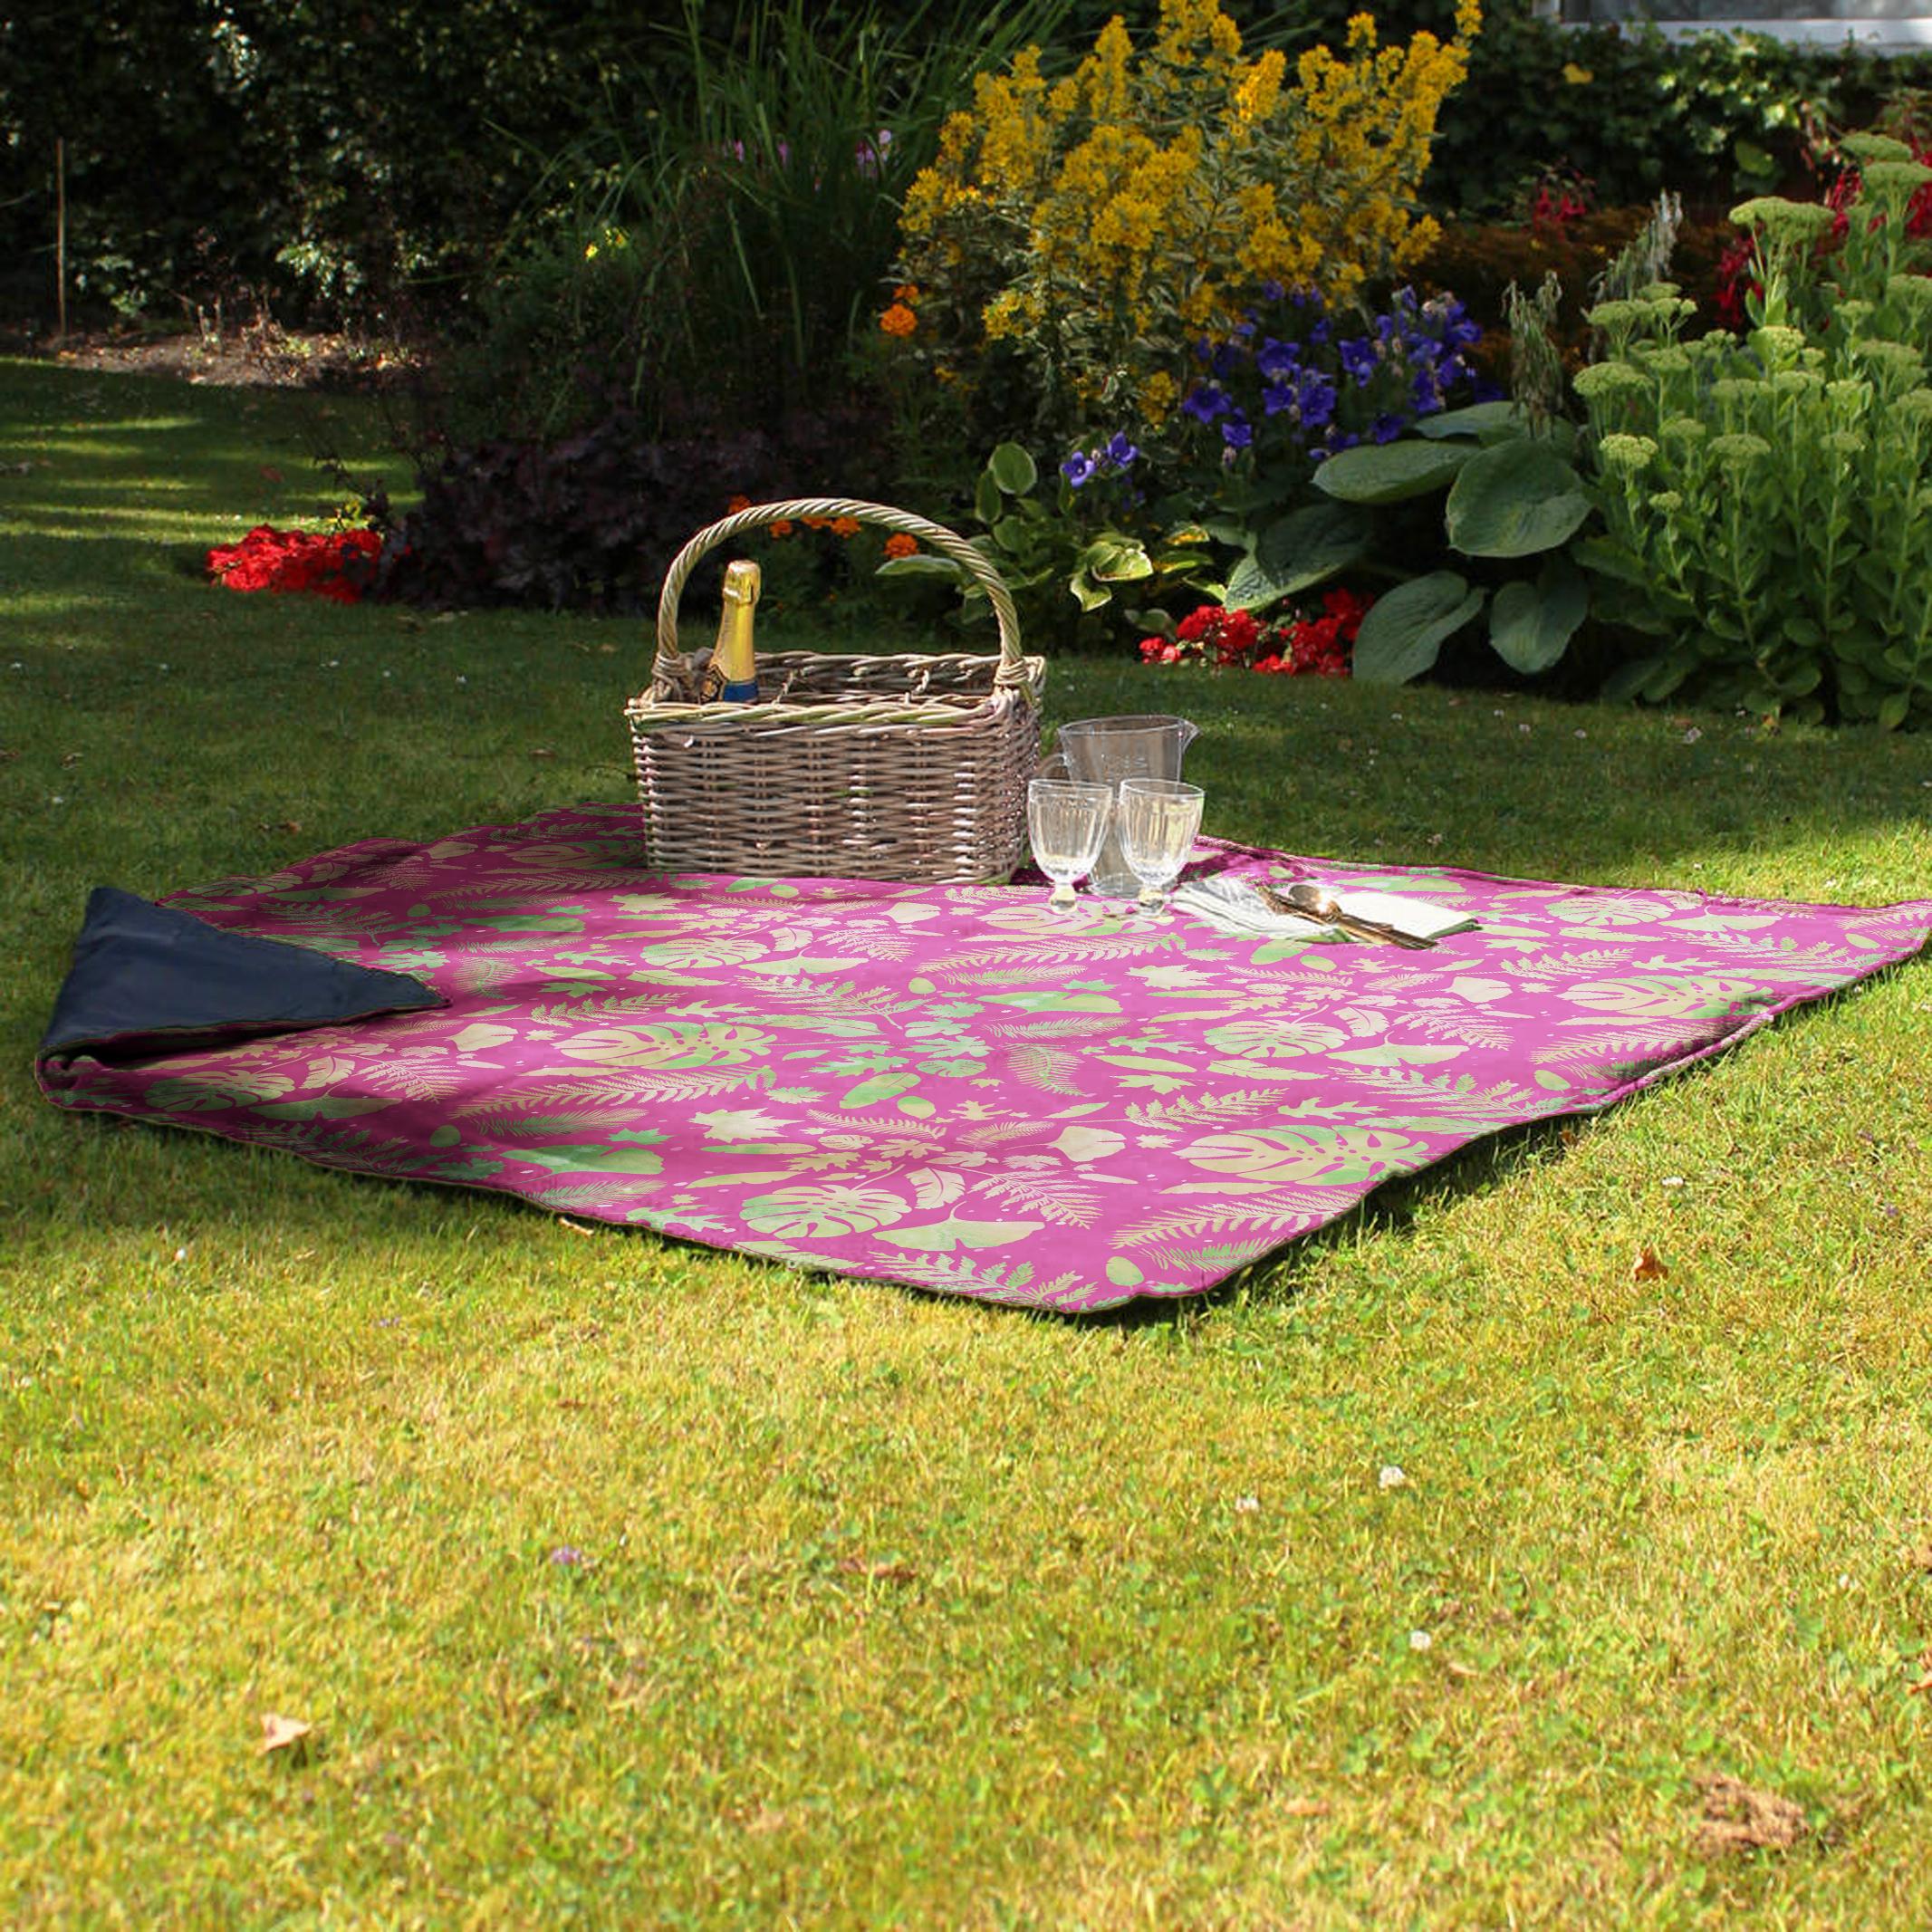 The Seeds Picnic Blanket.jpg